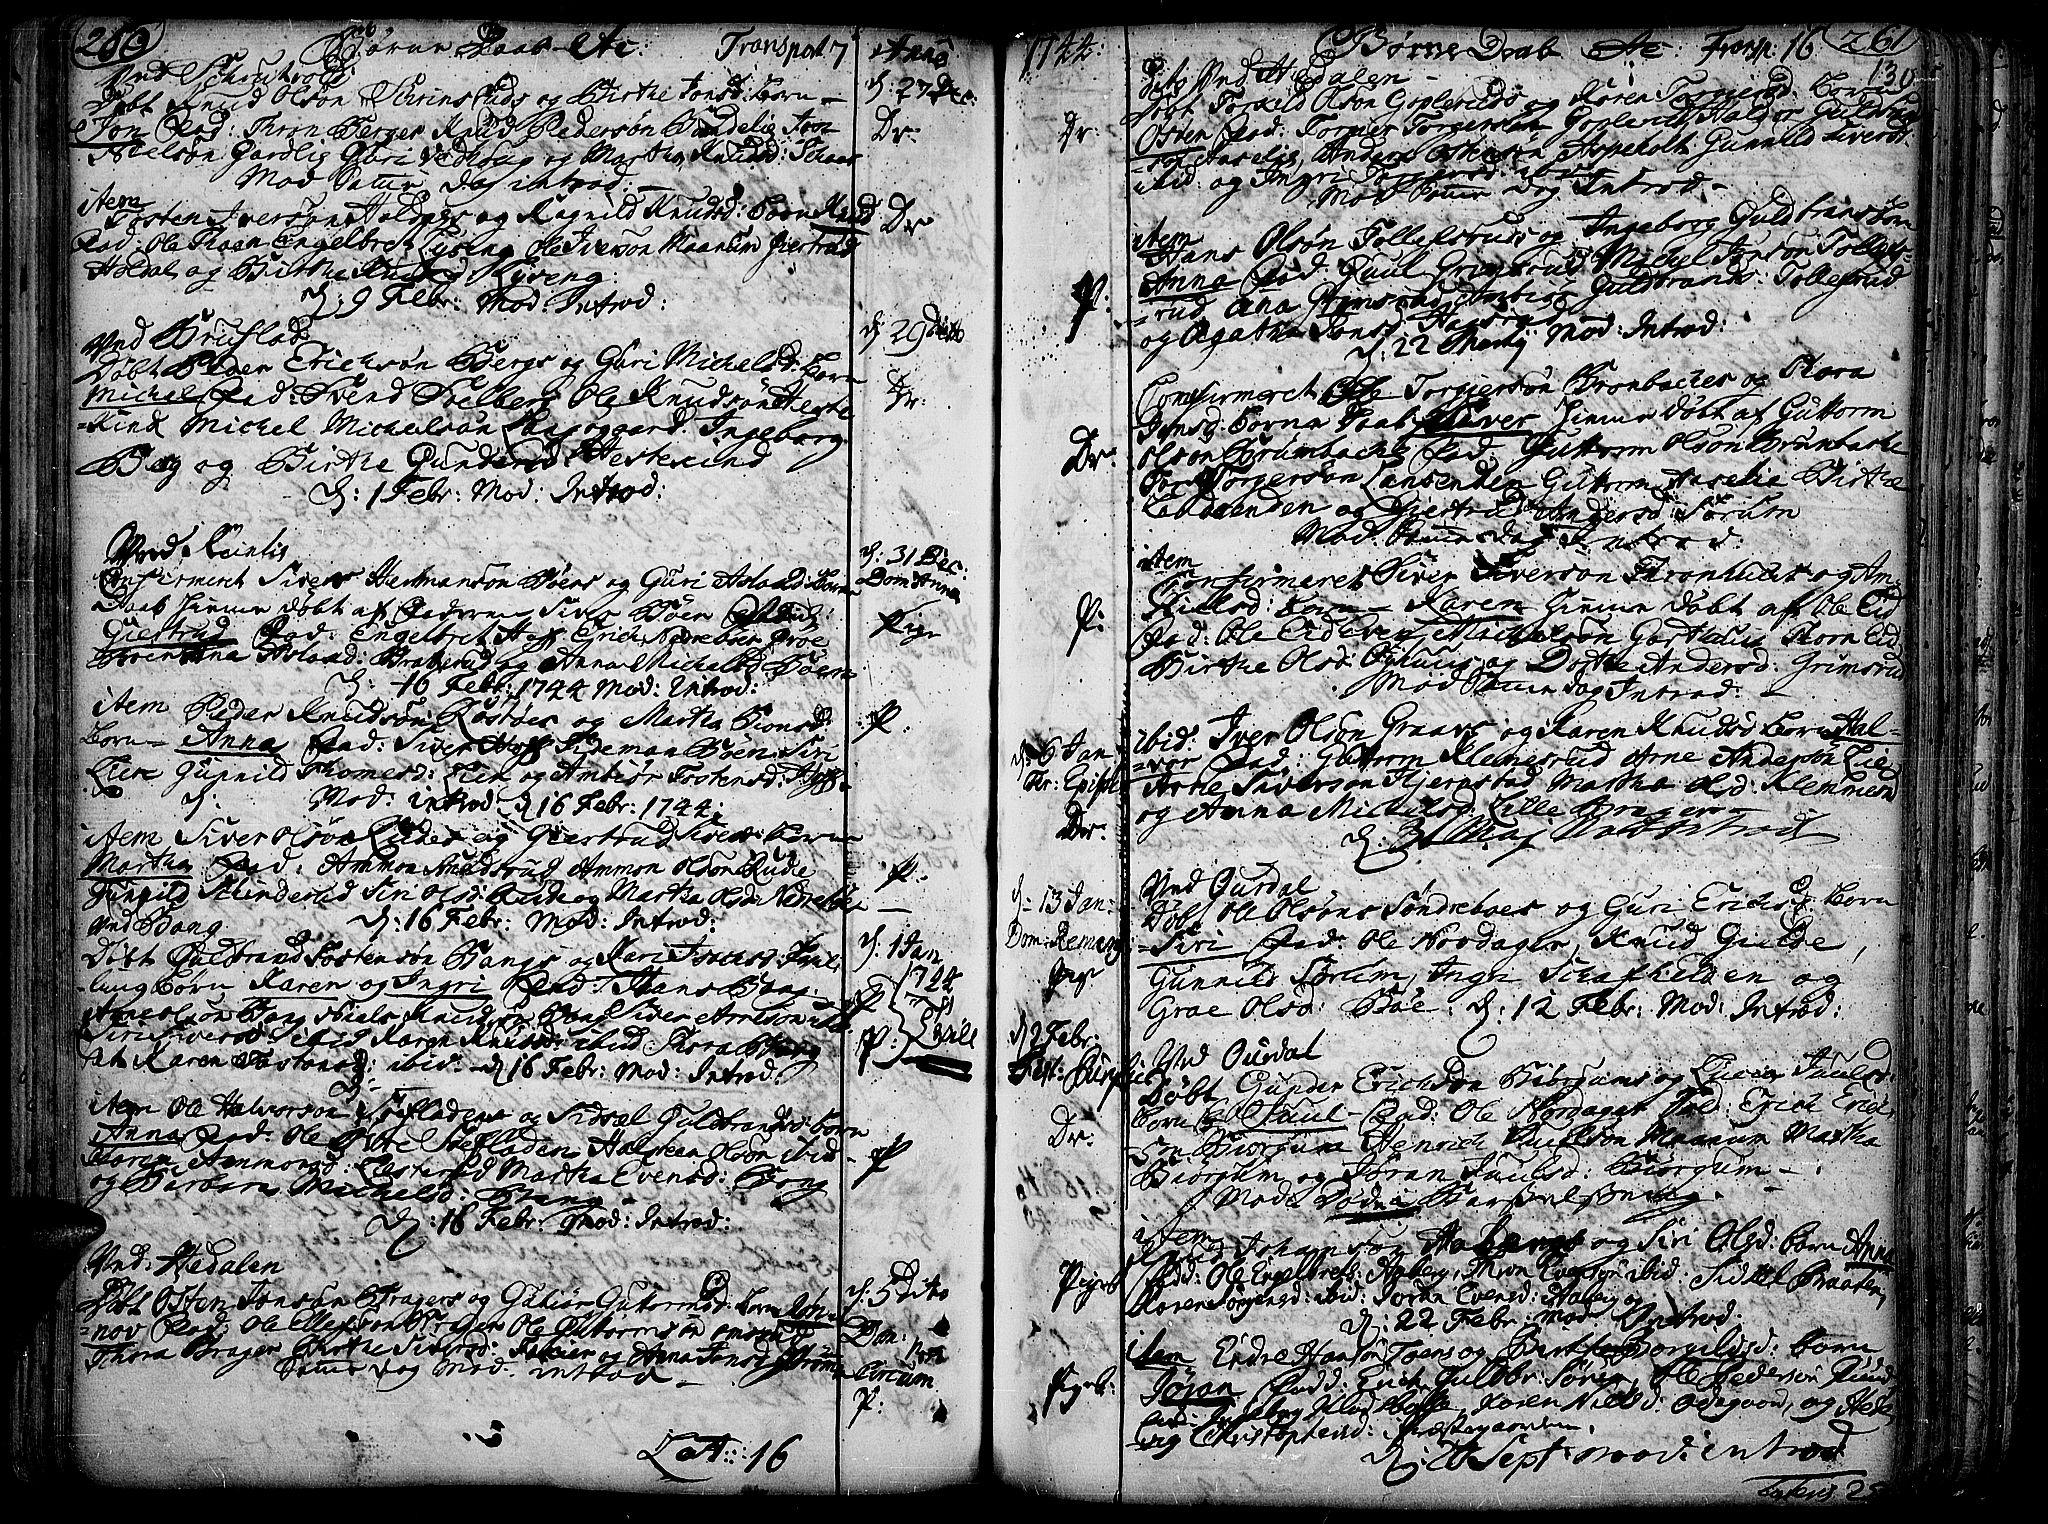 SAH, Aurdal prestekontor, Ministerialbok nr. 4, 1730-1762, s. 260-261